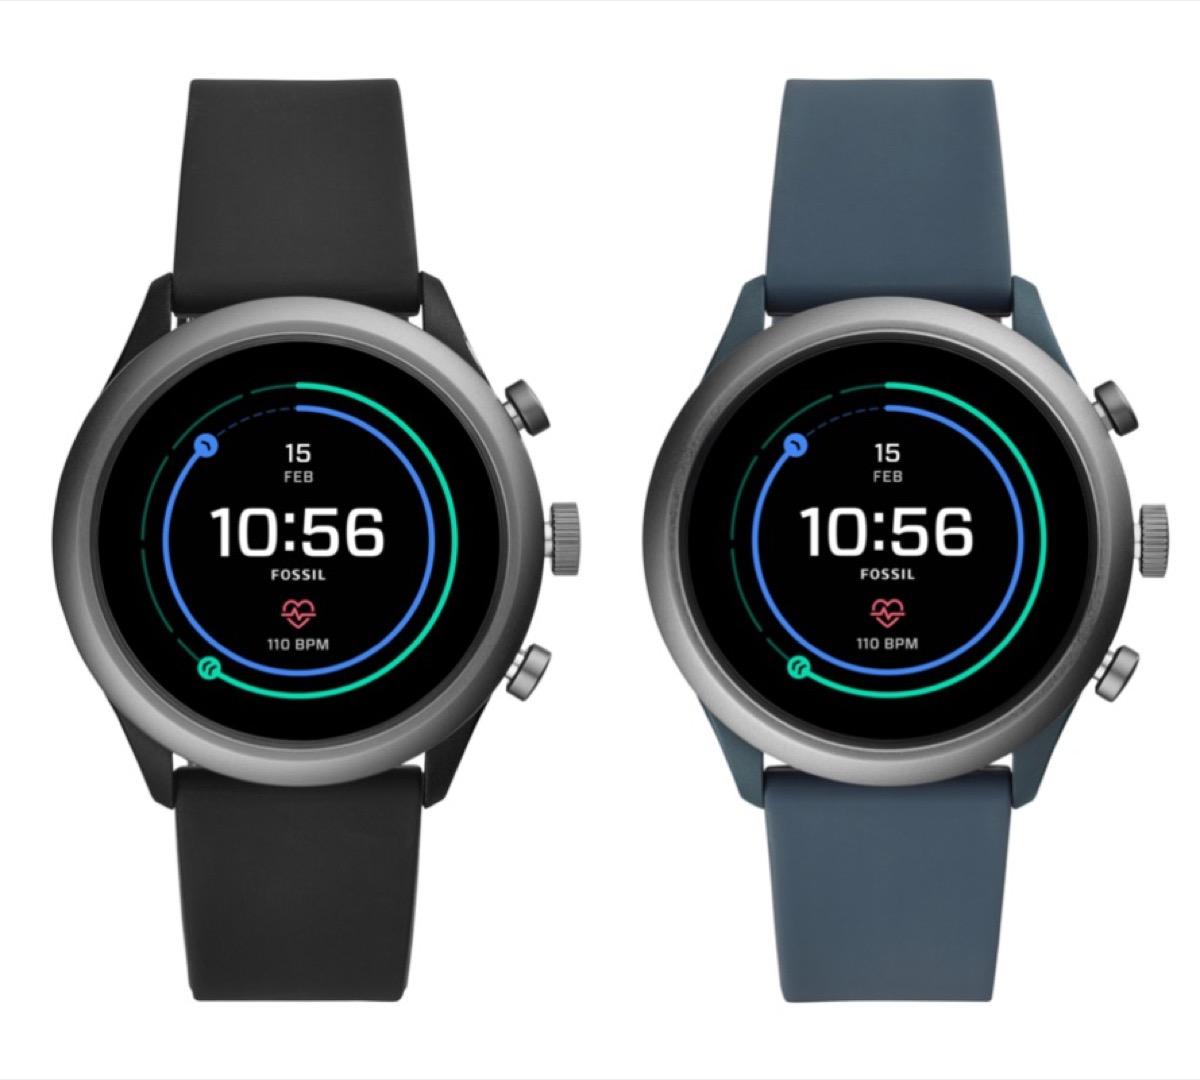 Fossil Sport, il primo smartwatch con Qualcomm Snapdragon Wear 3100